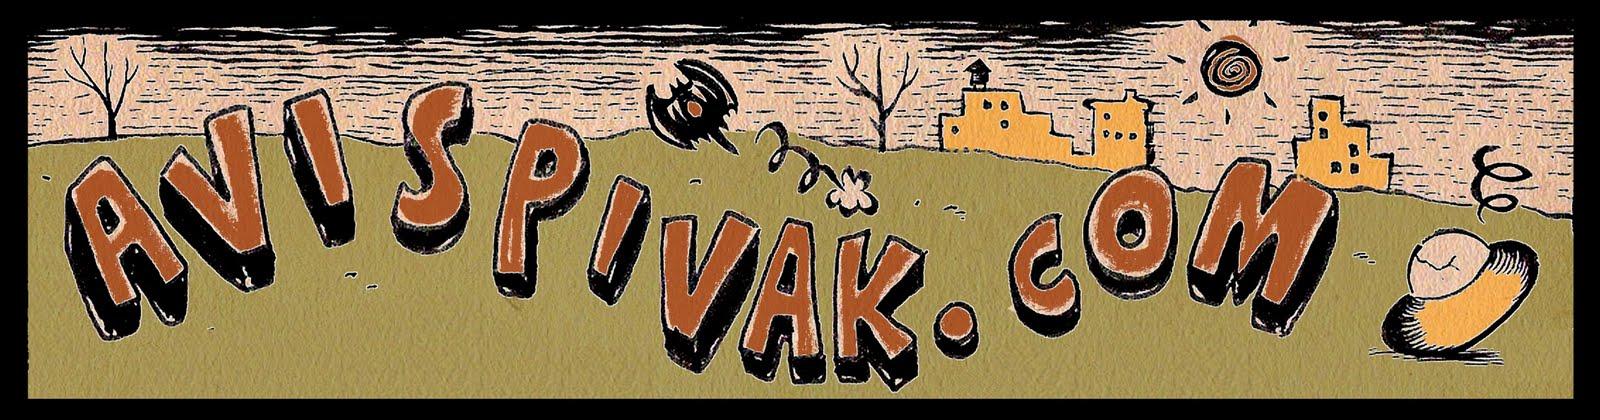 Avi Spivak